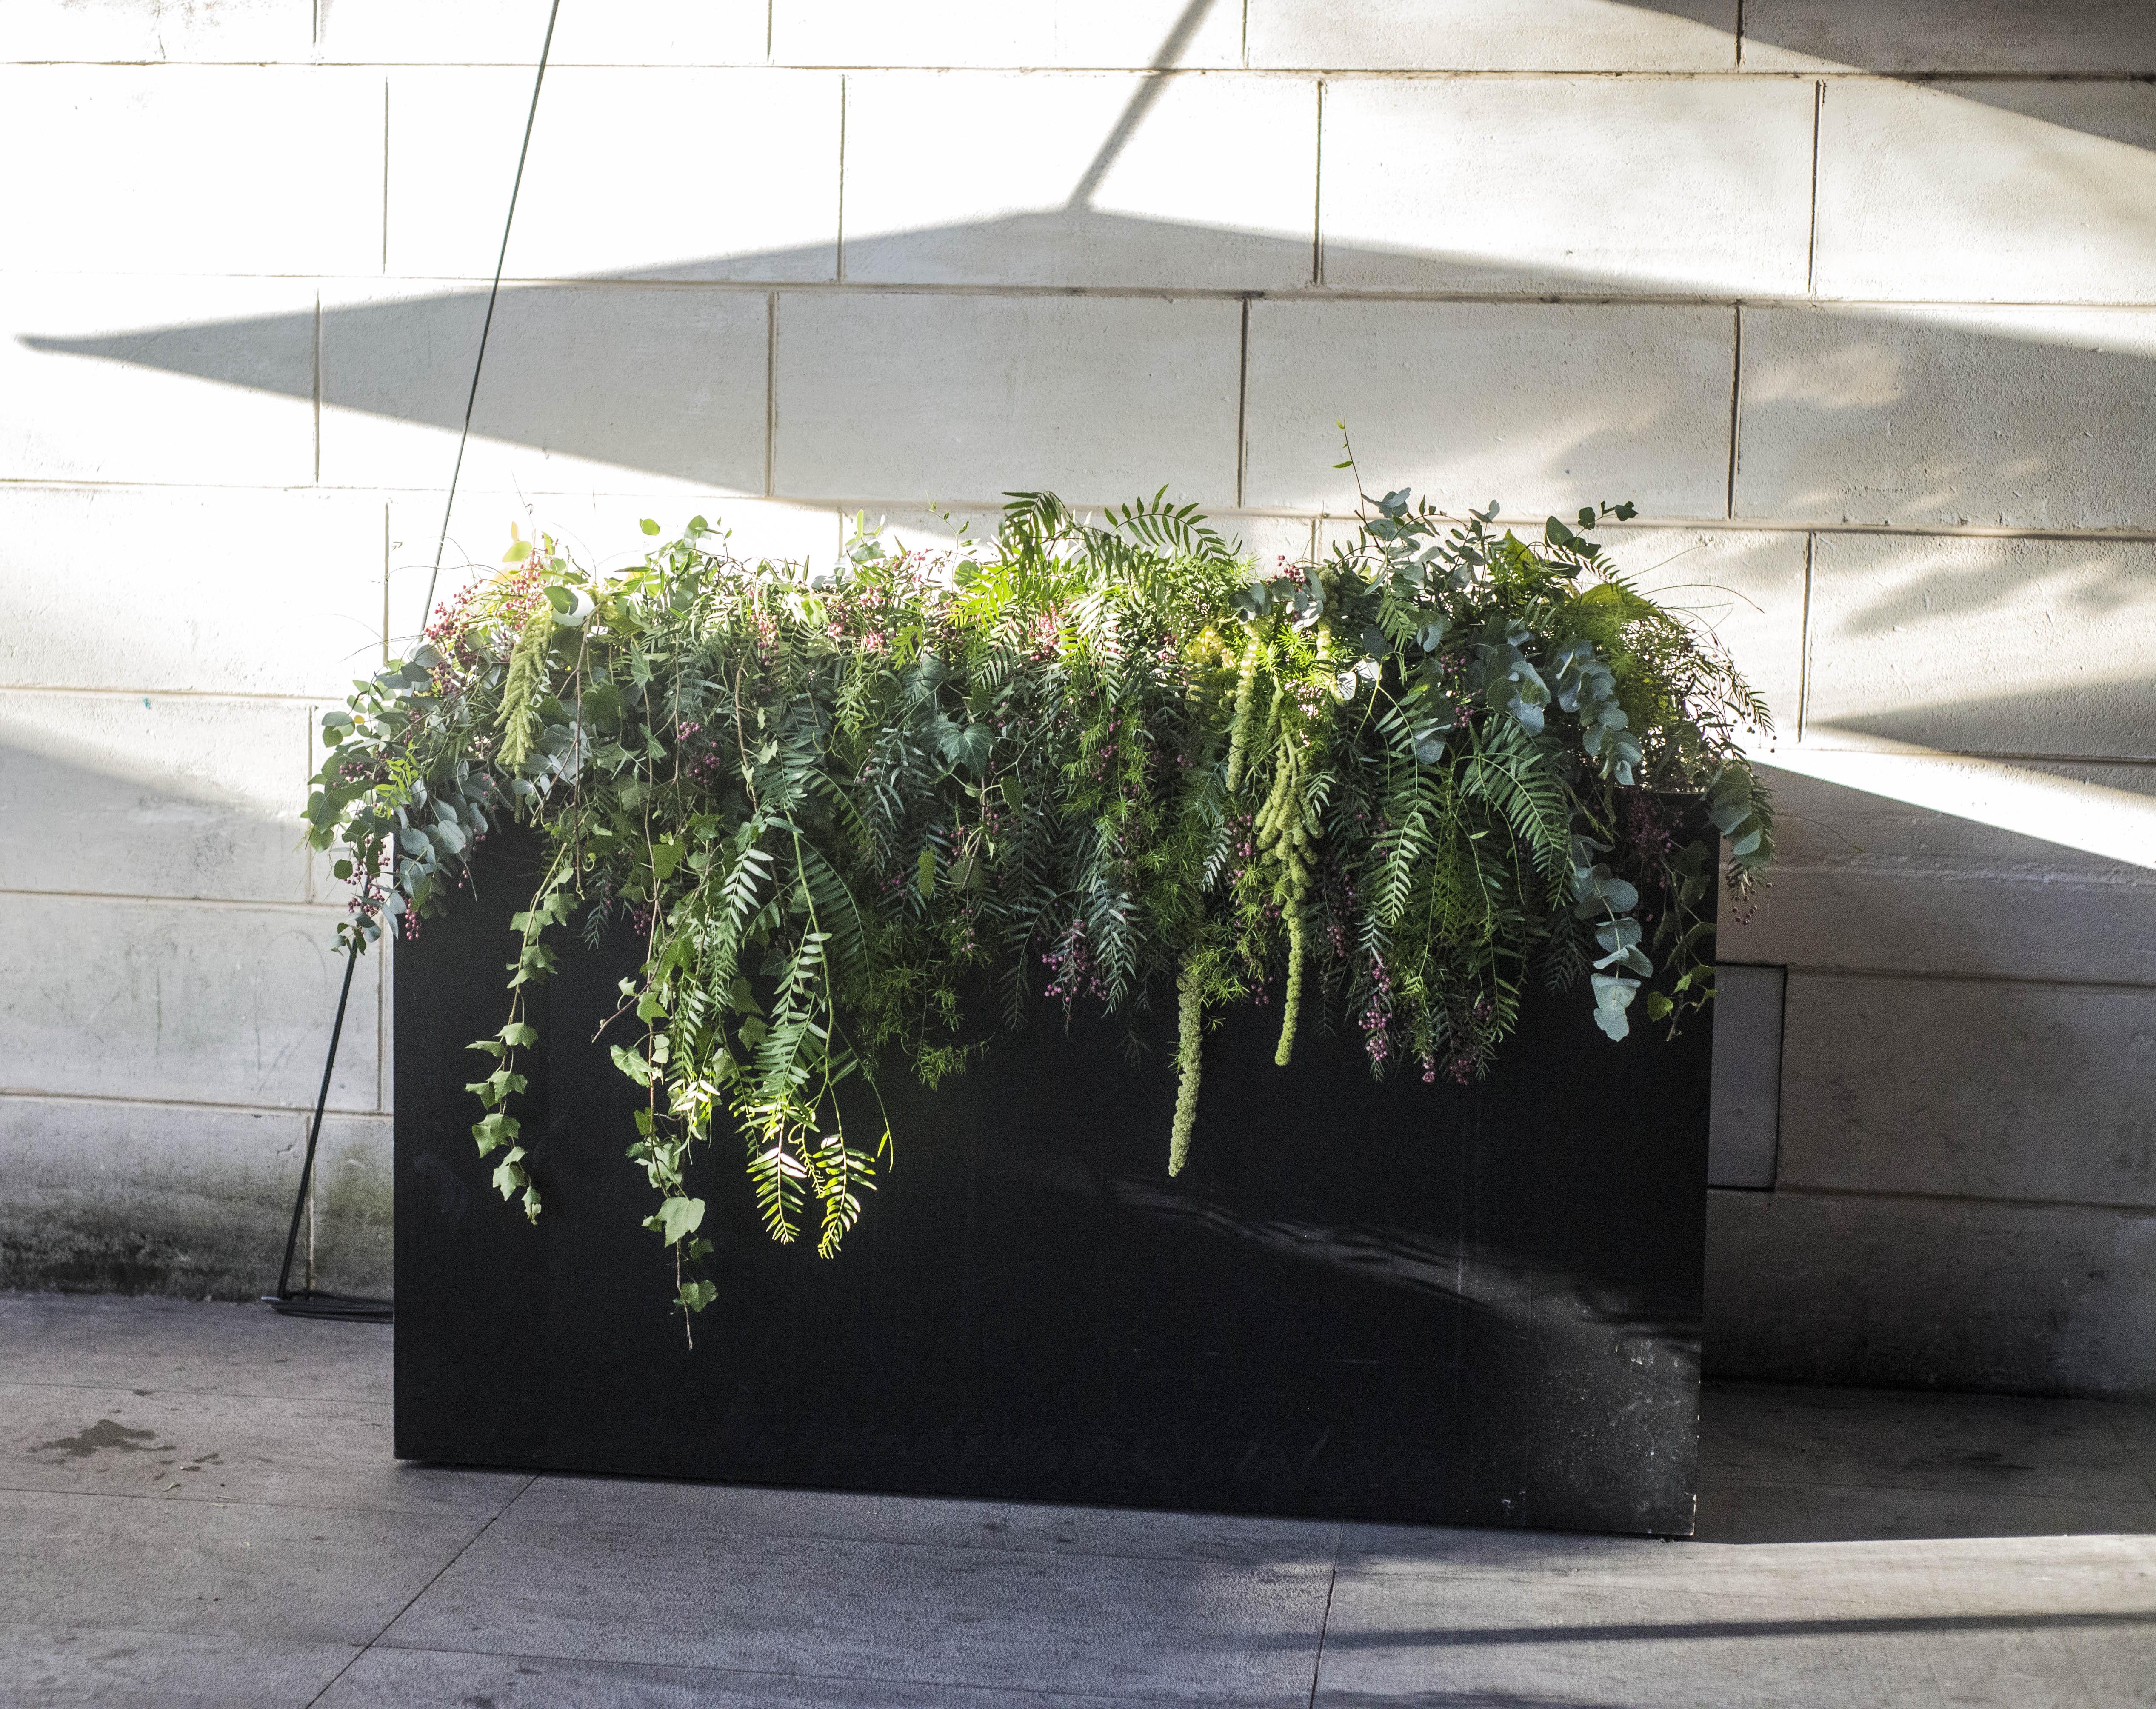 Abundant green feature flowers